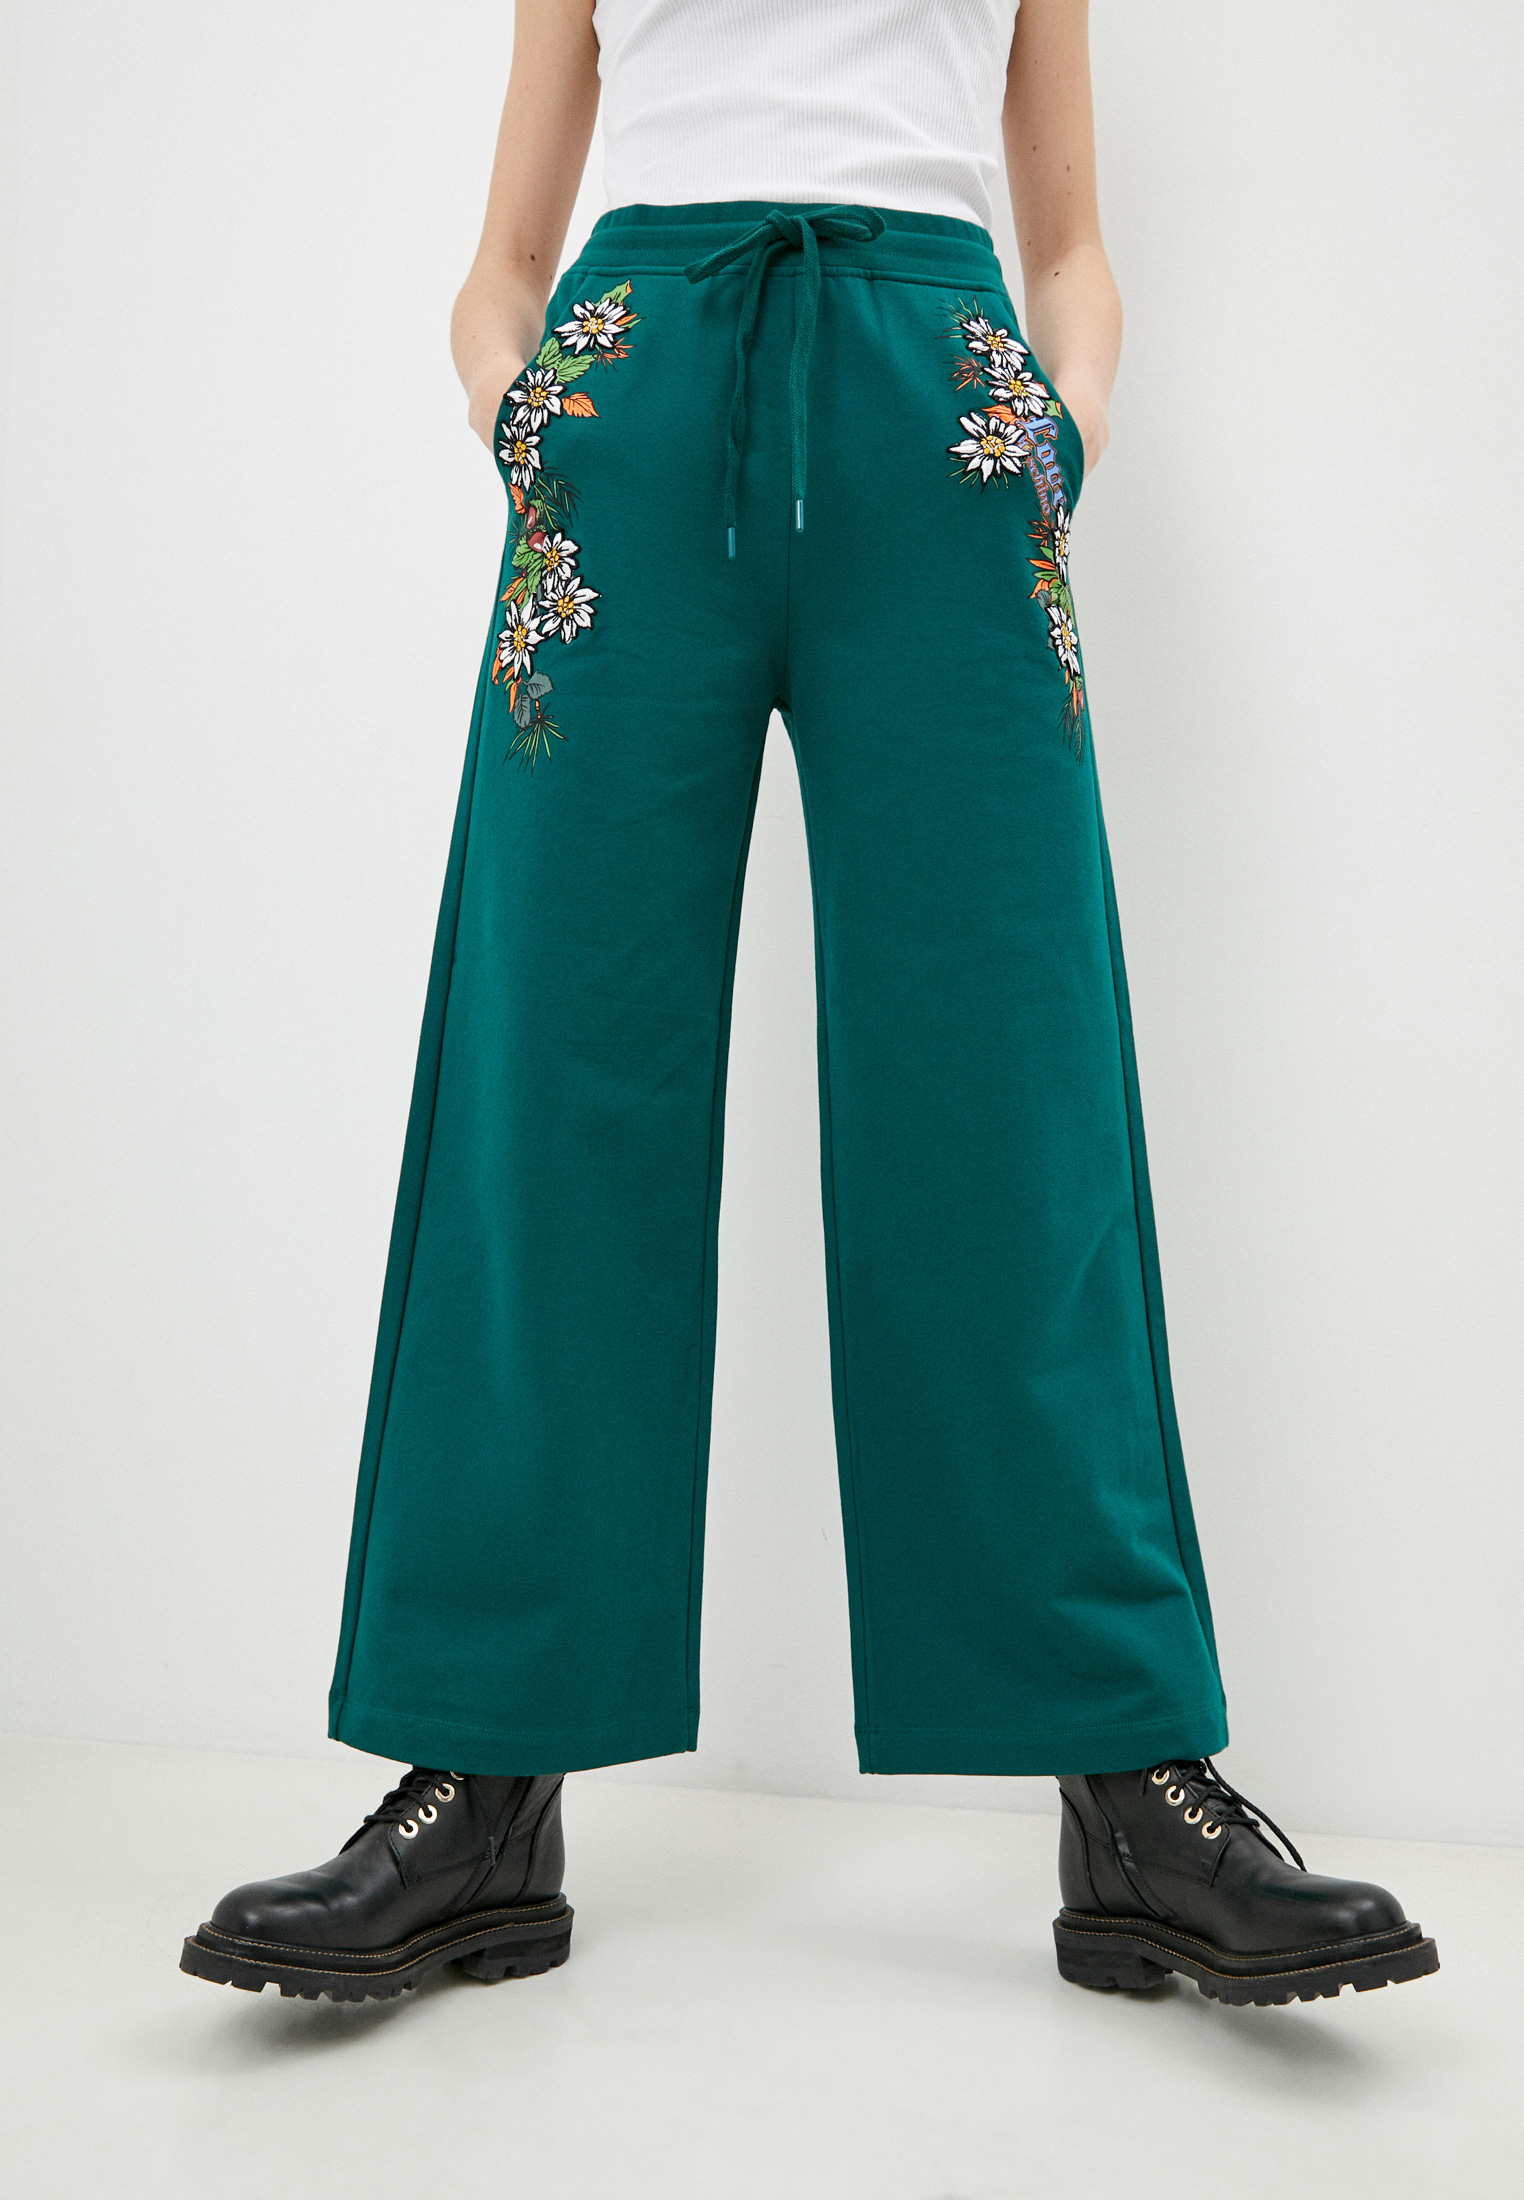 Женские спортивные брюки Love Moschino (Лав Москино) W 1 487 01 E 1958